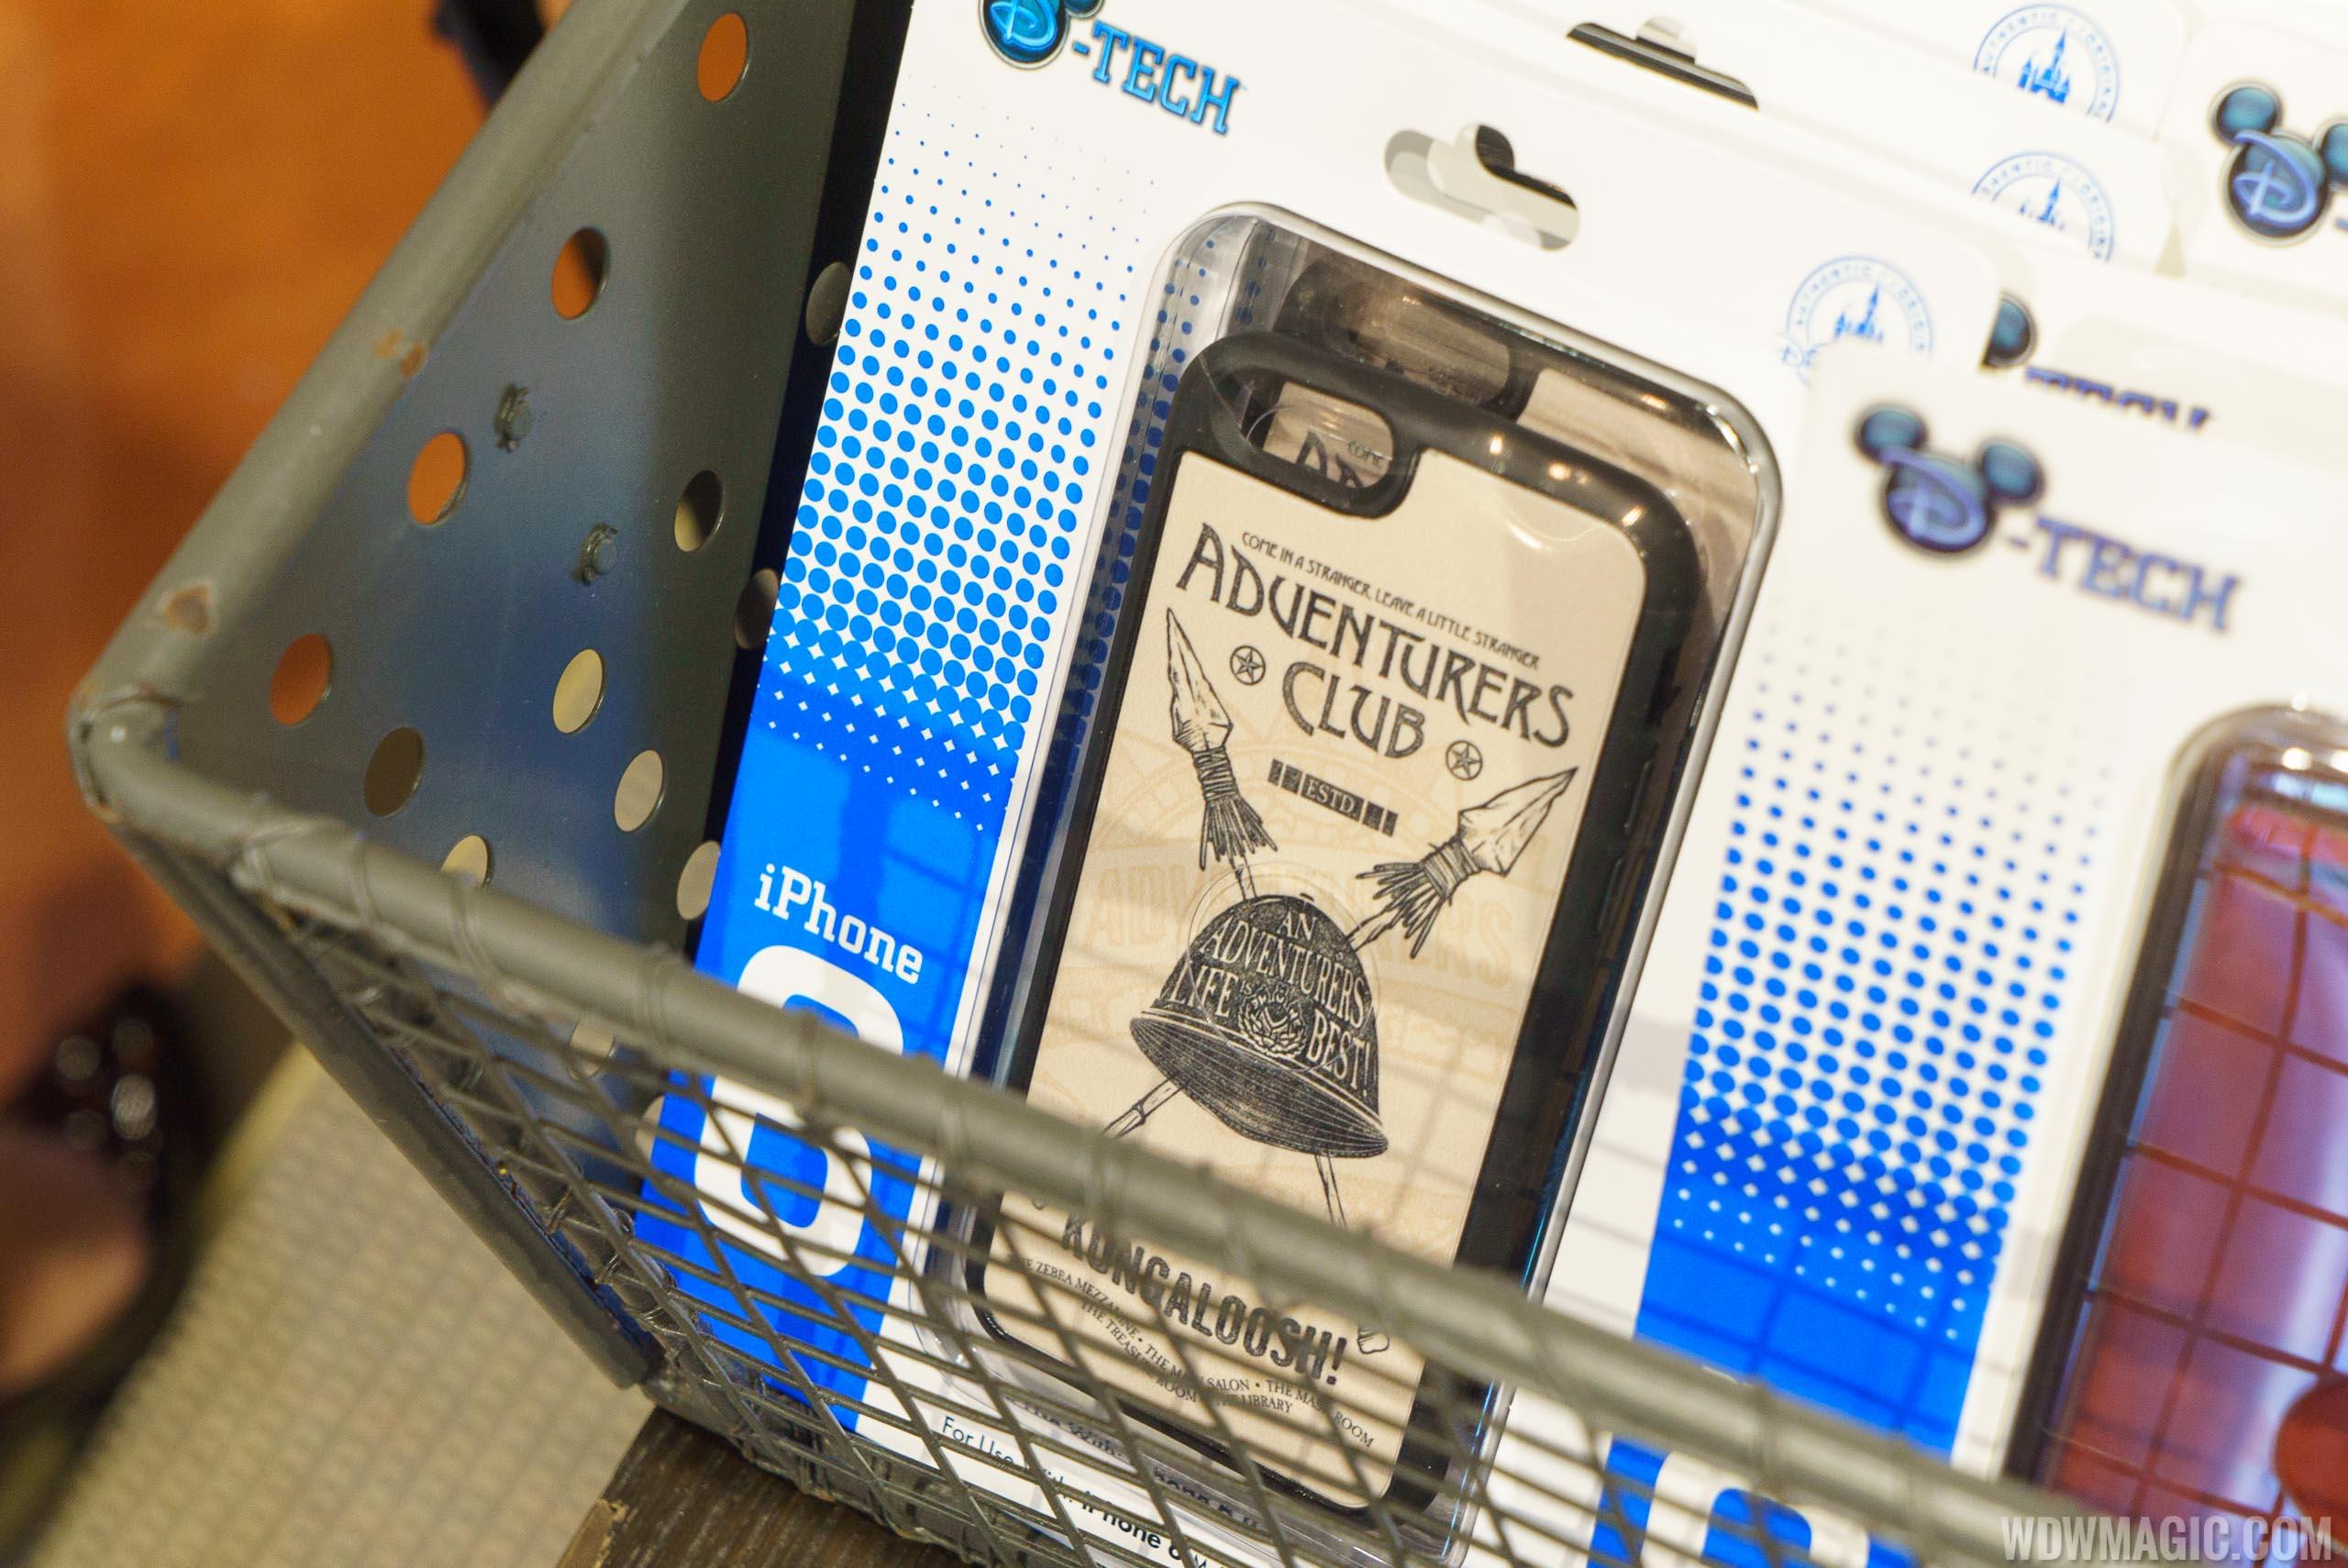 Adventurer's Club phone case